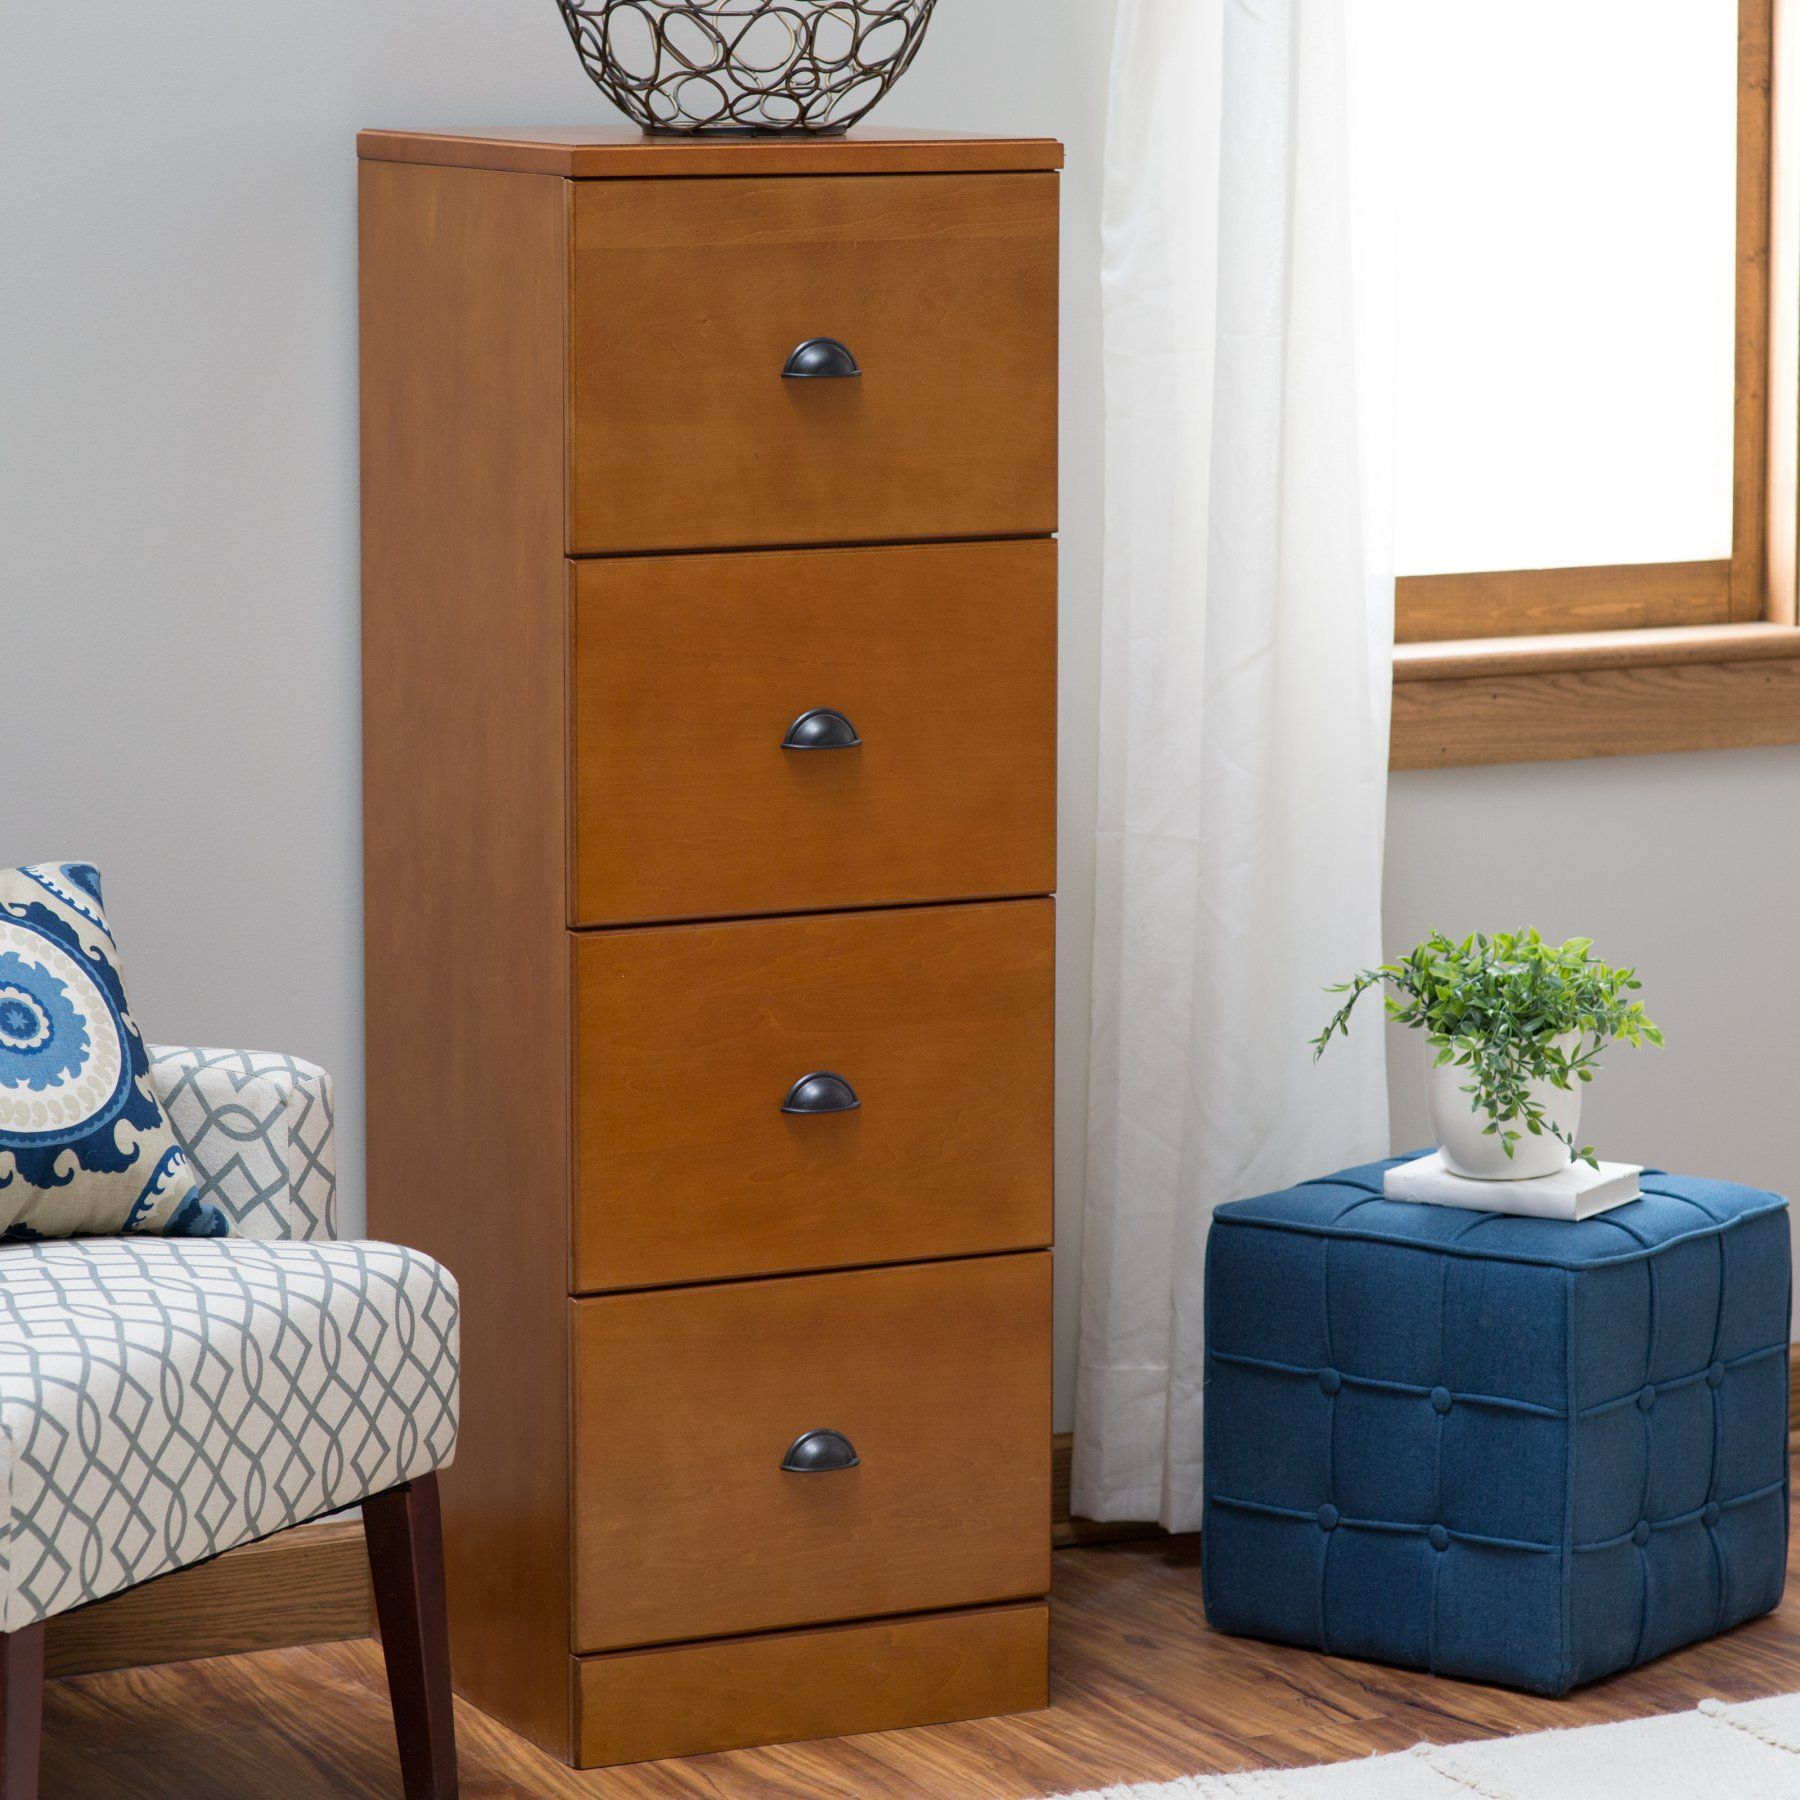 Unique Buena Vista 2 Drawer Lateral Filing Cabinet